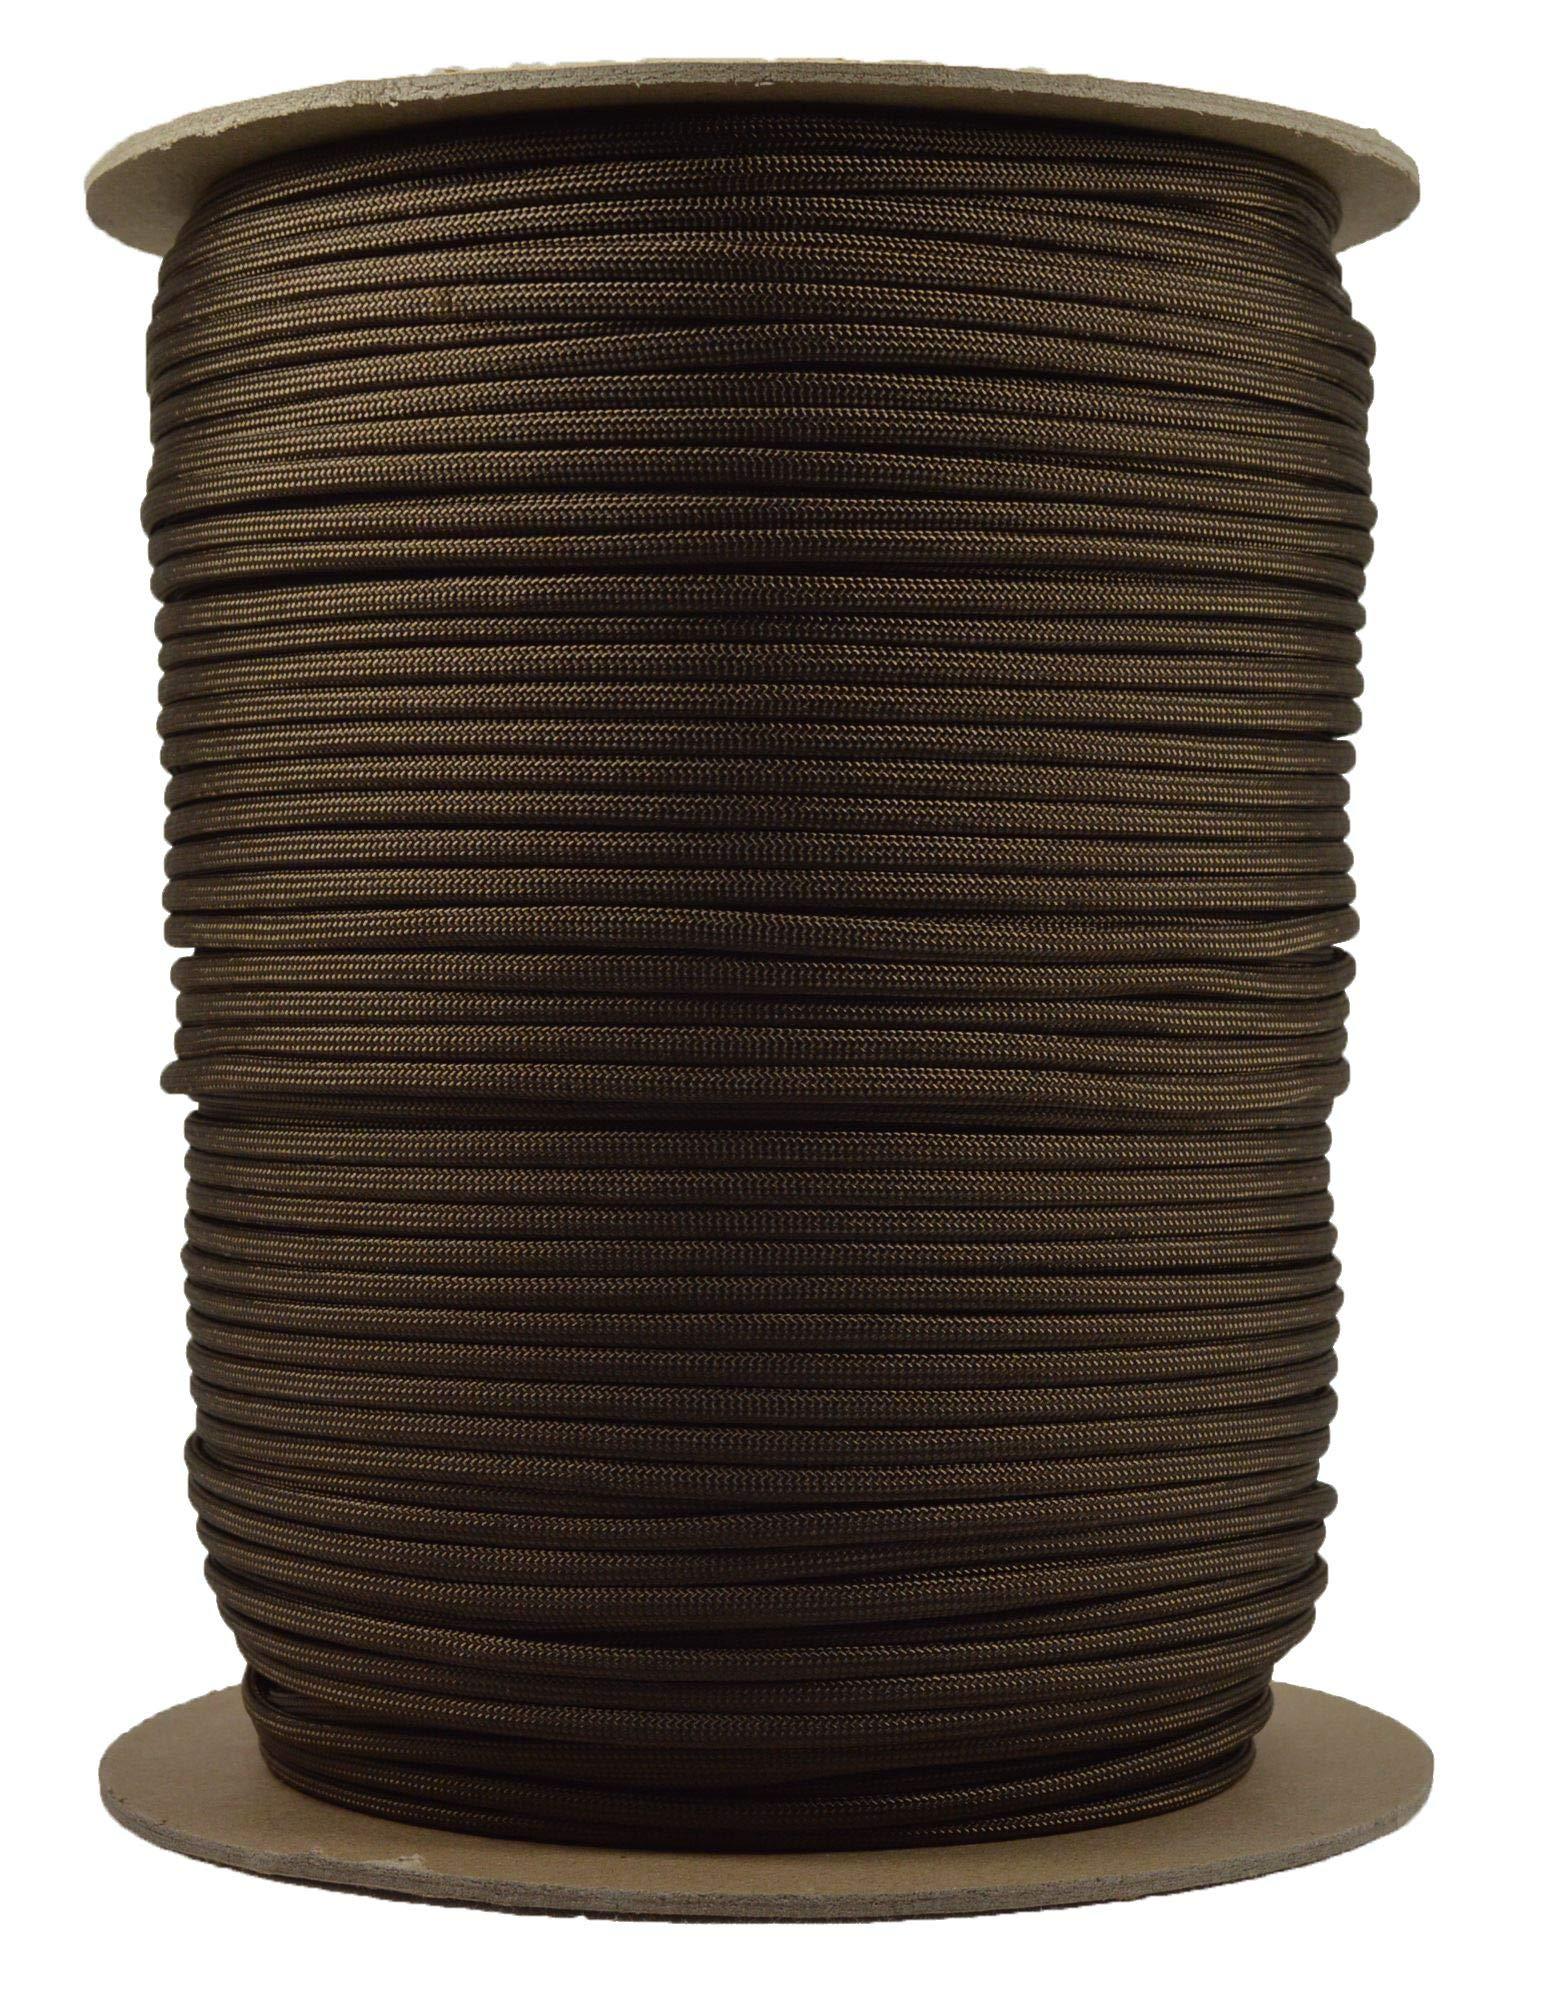 Acid BrownMil-Spec Commercial Grade 550lb Type III Nylon Paracord - 1000 Foot Spool